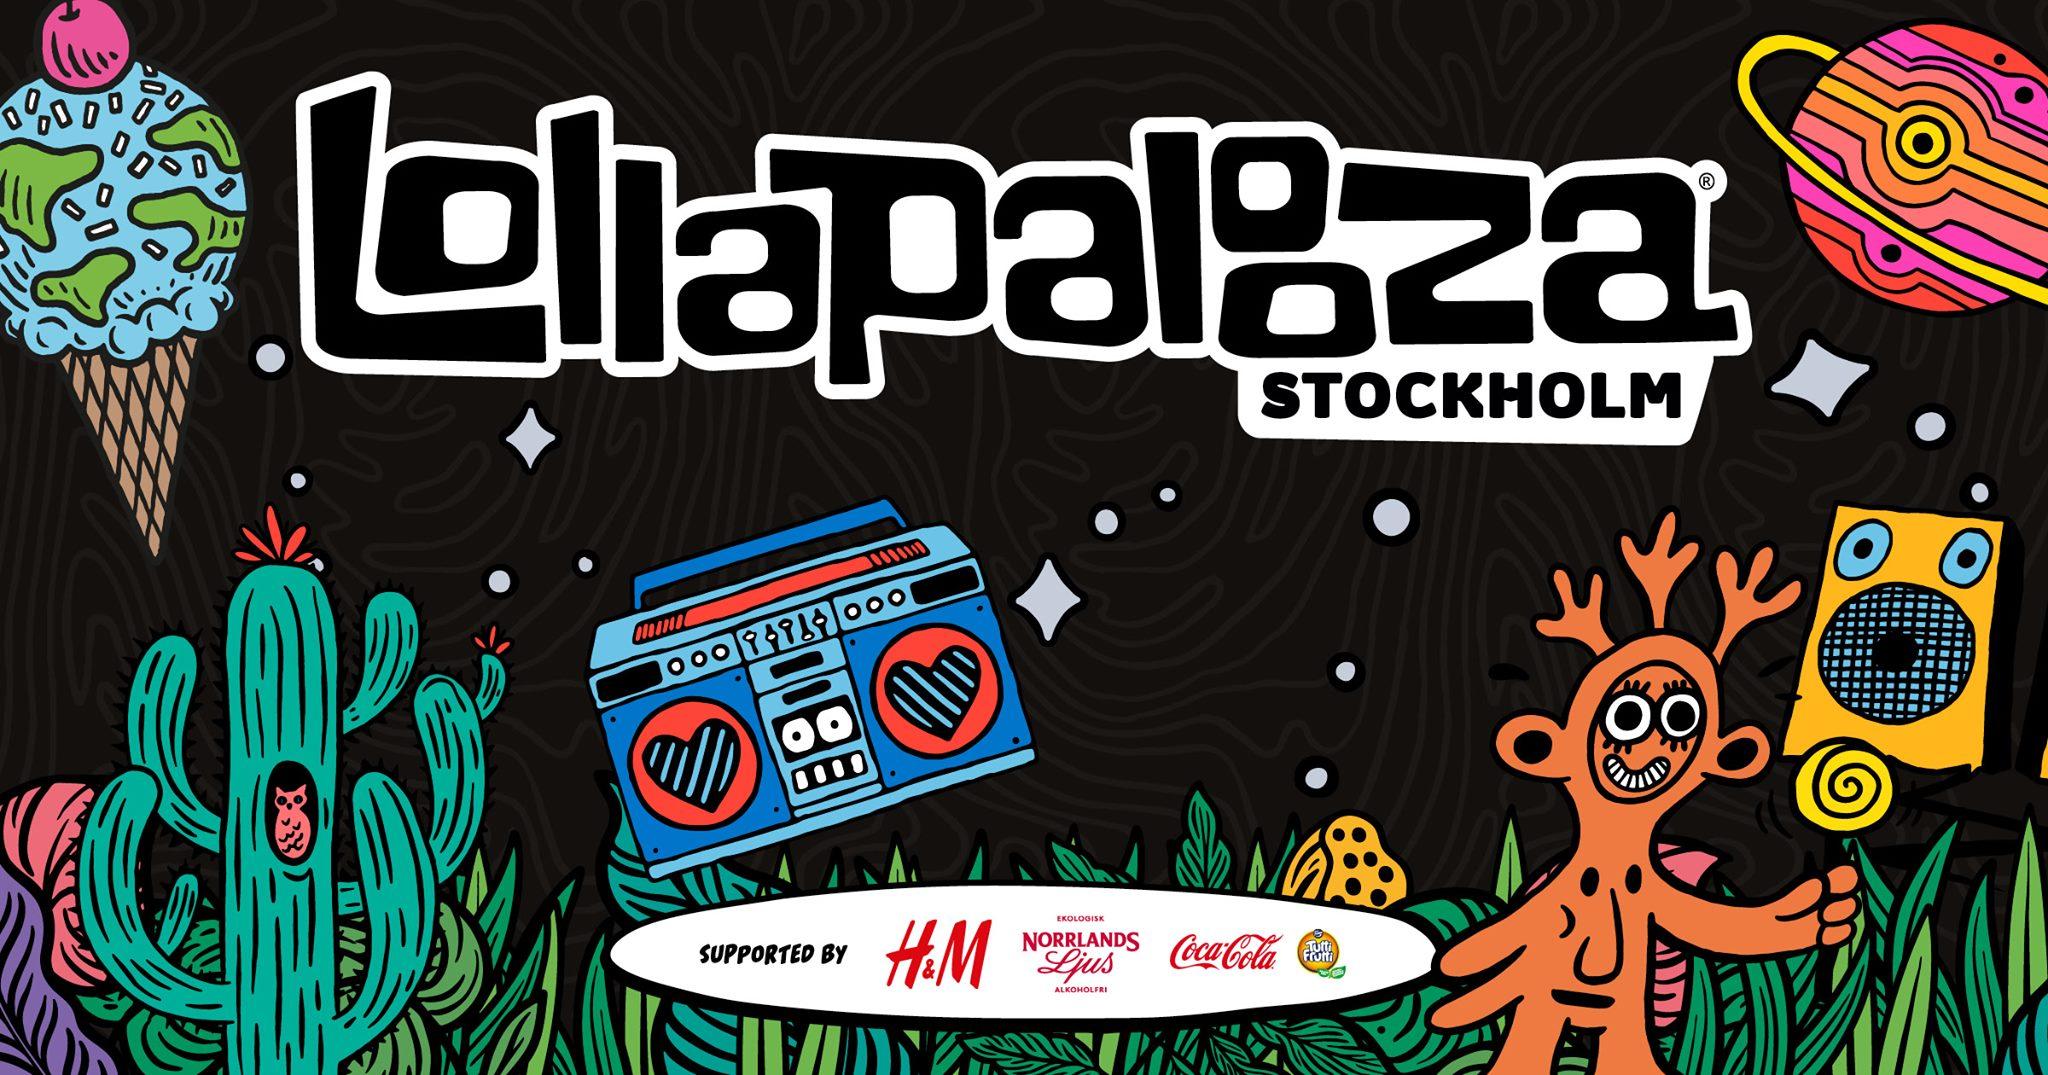 Lollapalooza Stockholm Announces 2020 Lineup: Pearl Jam, Kendrick Lamar, Anderson .Paak, More